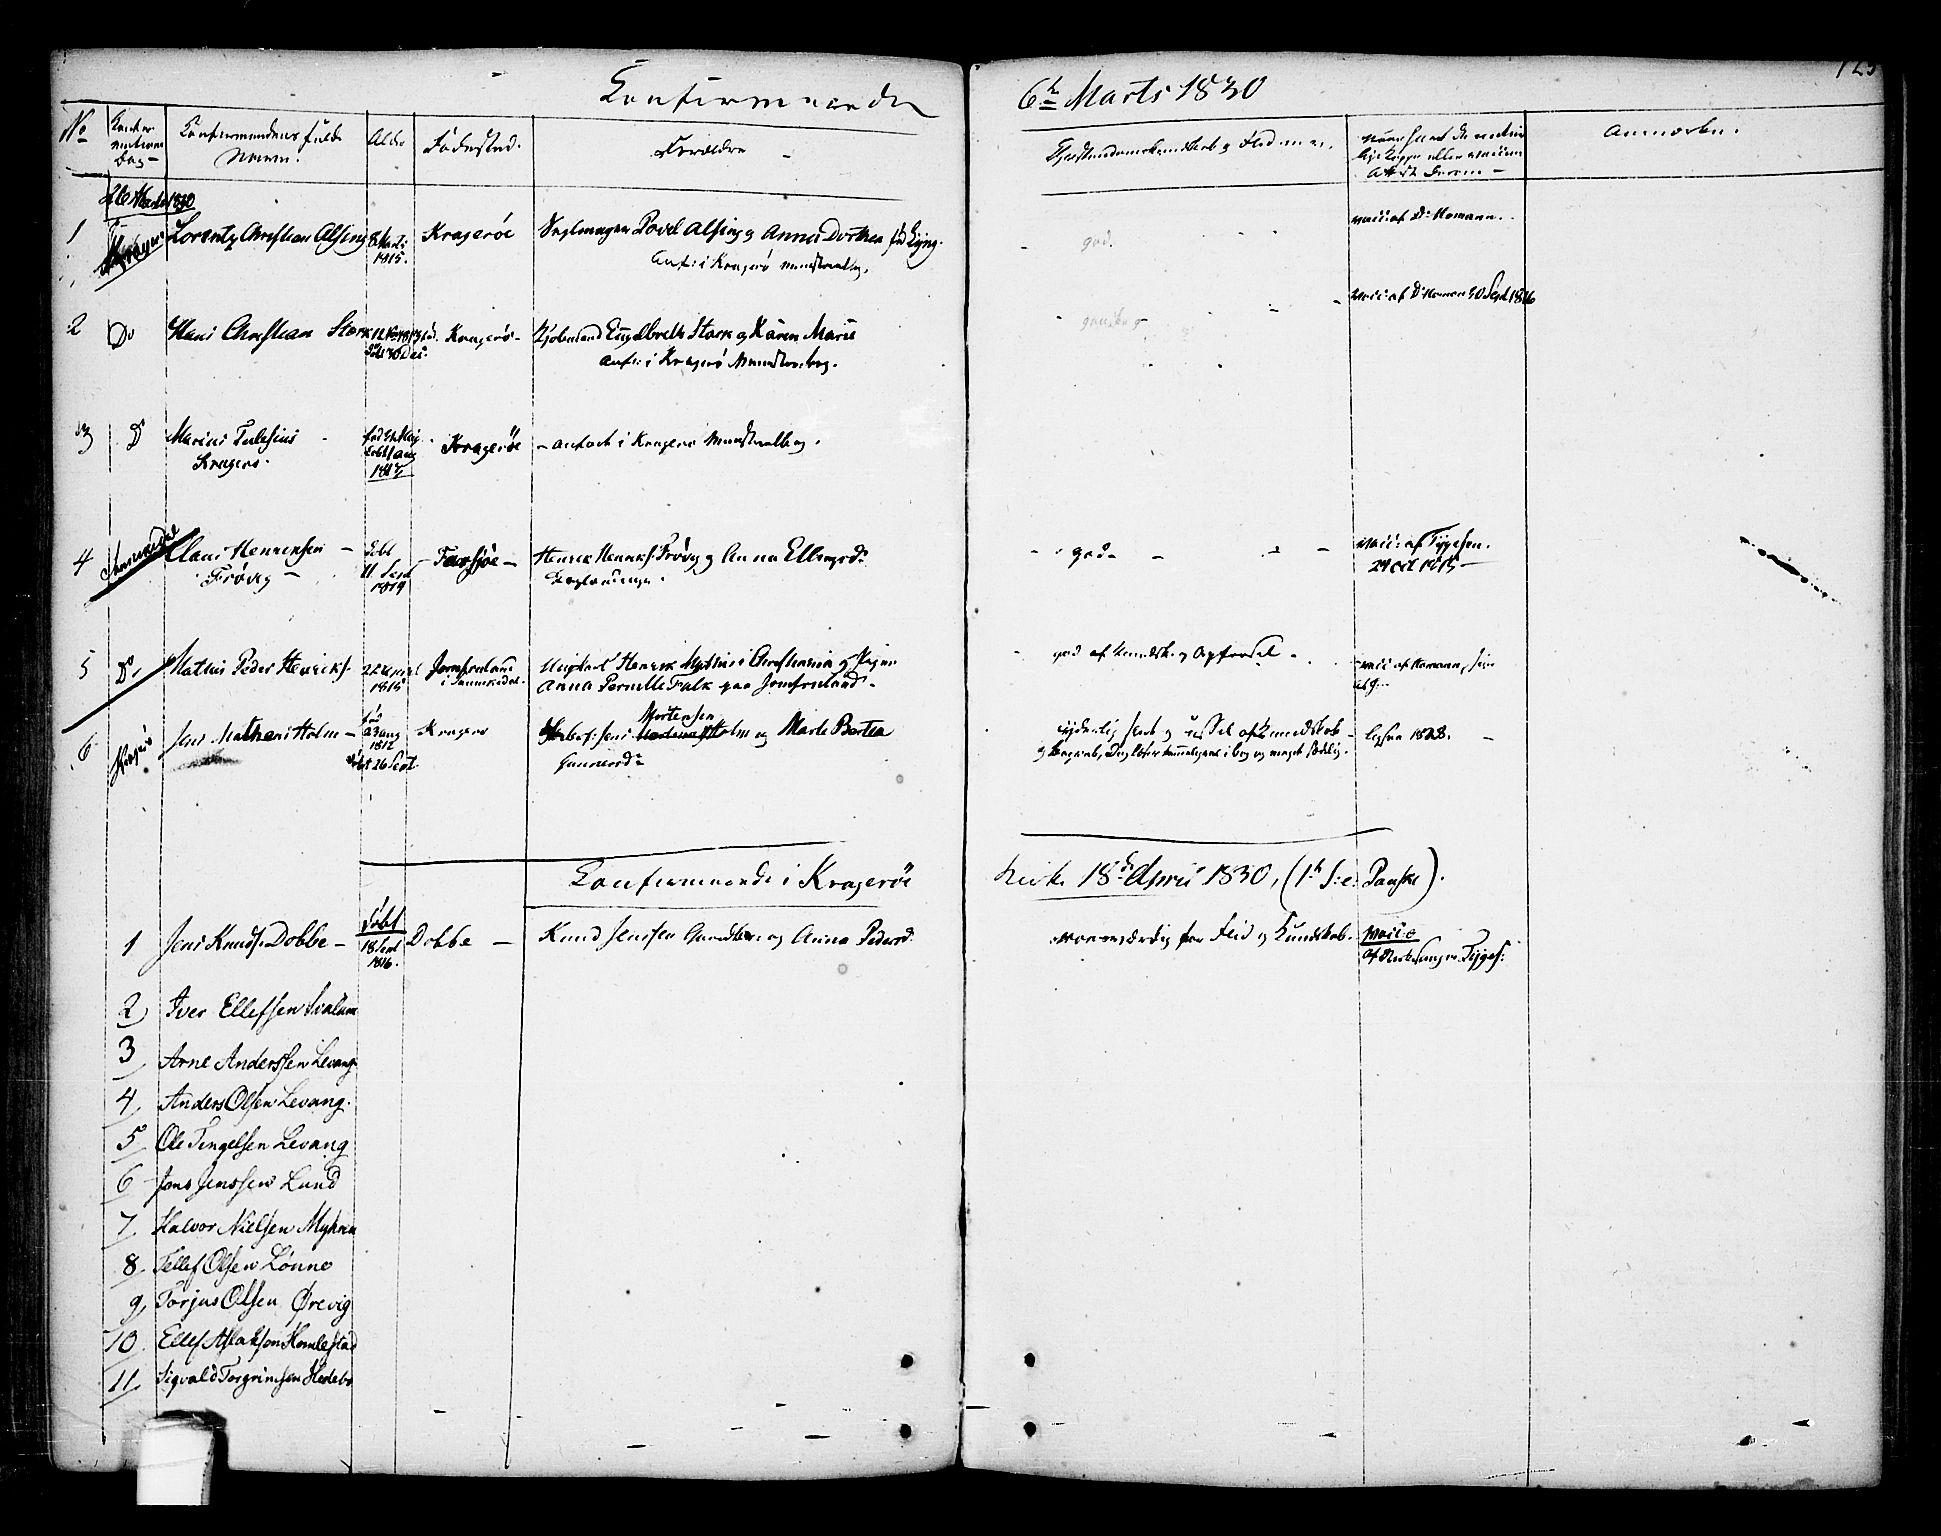 SAKO, Kragerø kirkebøker, F/Fa/L0002: Ministerialbok nr. 2, 1767-1802, s. 125